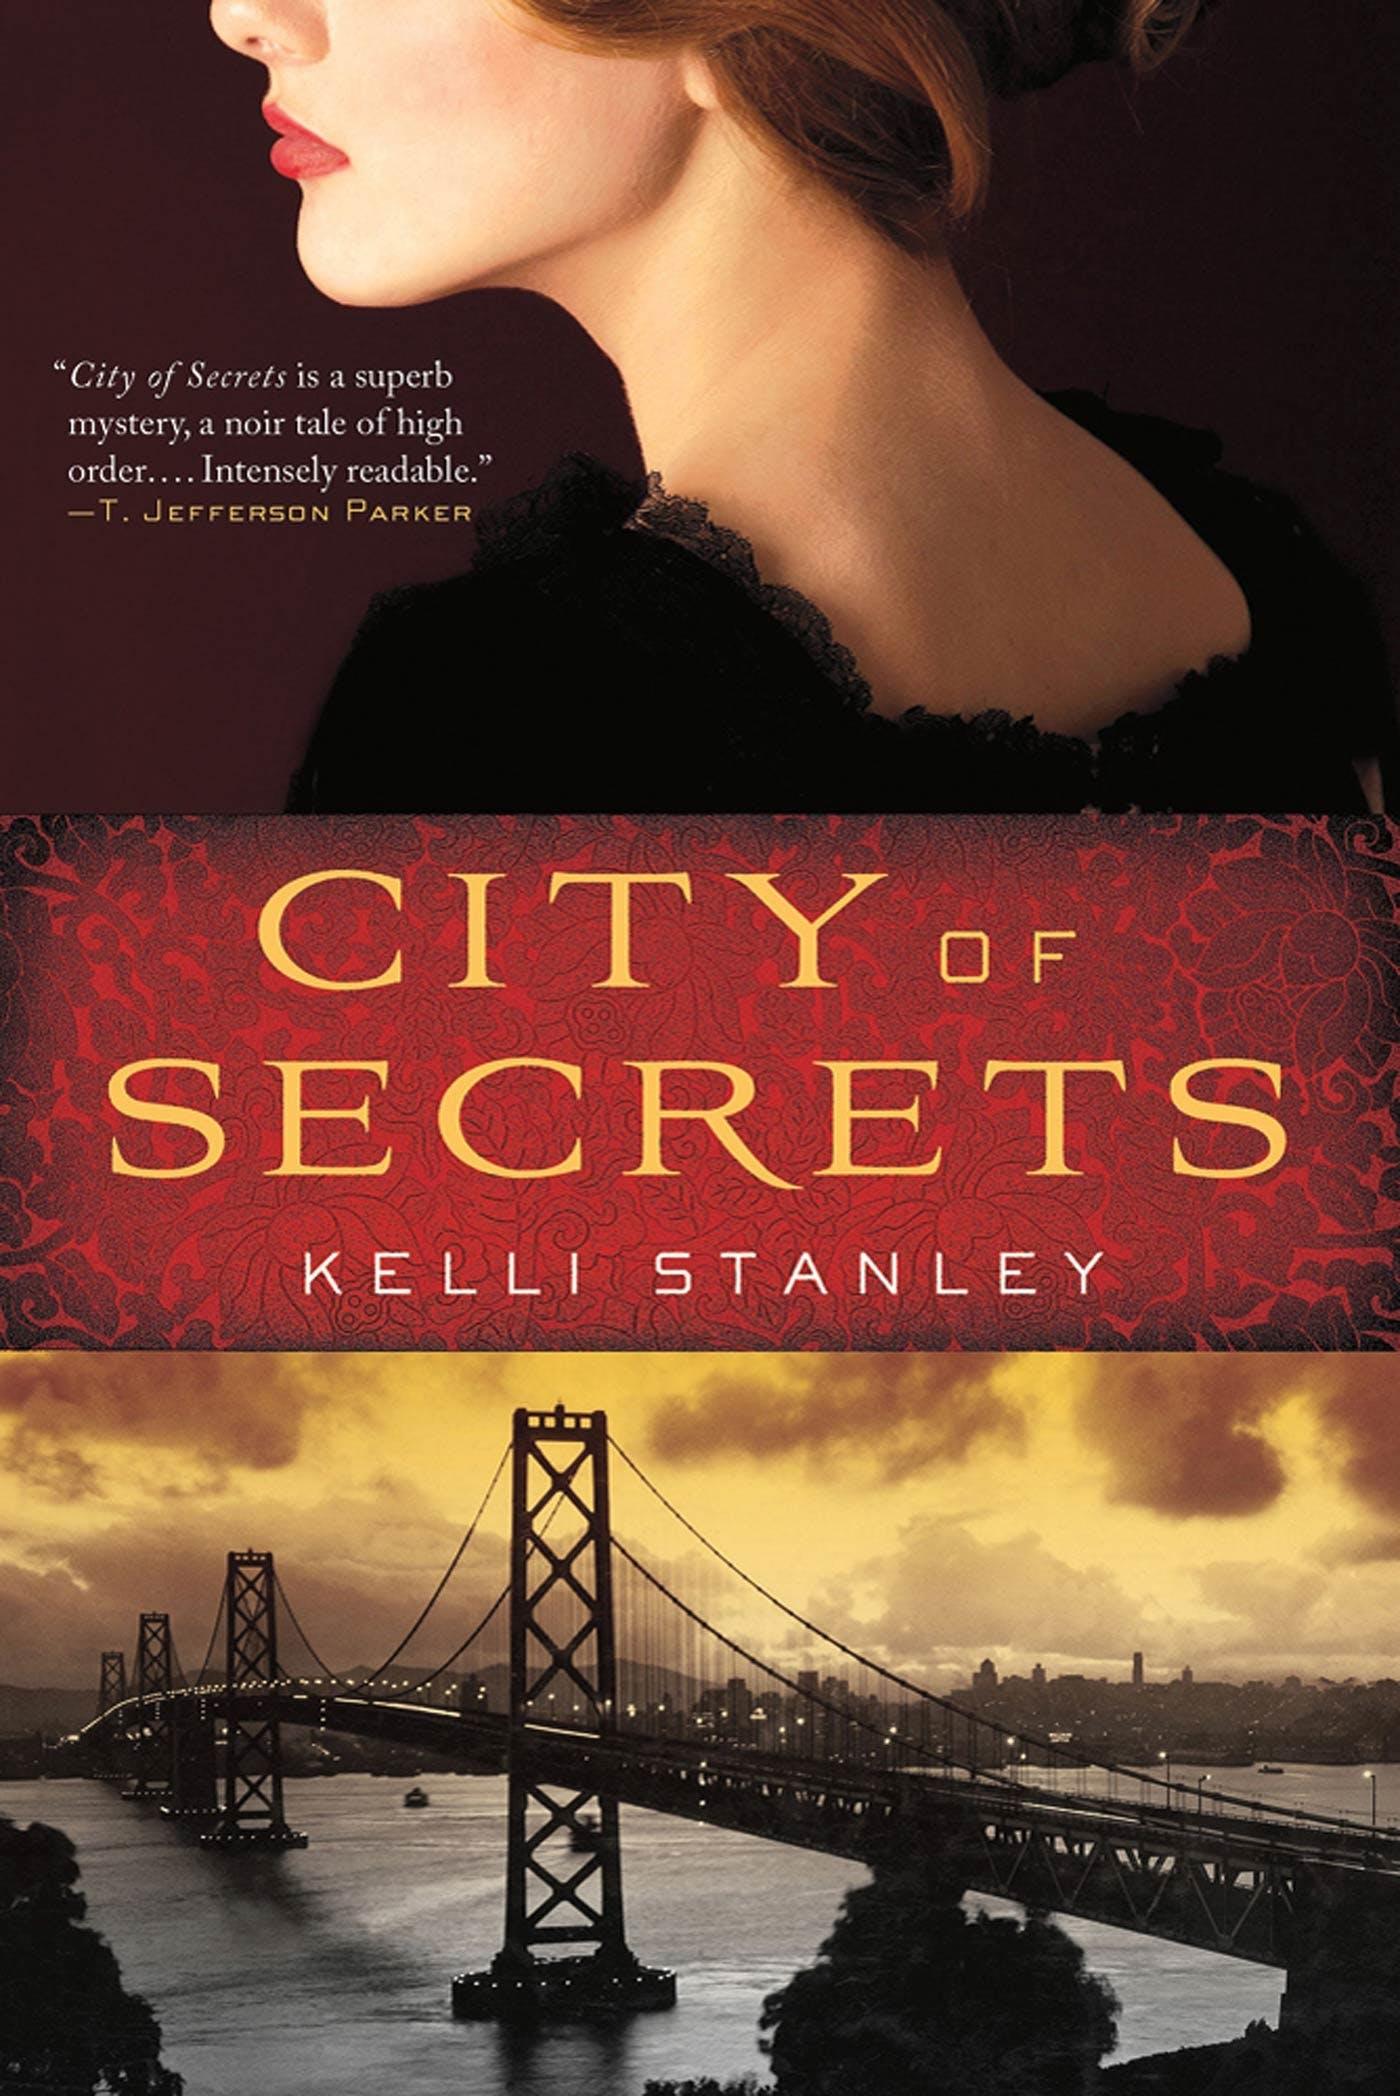 Image of City of Secrets